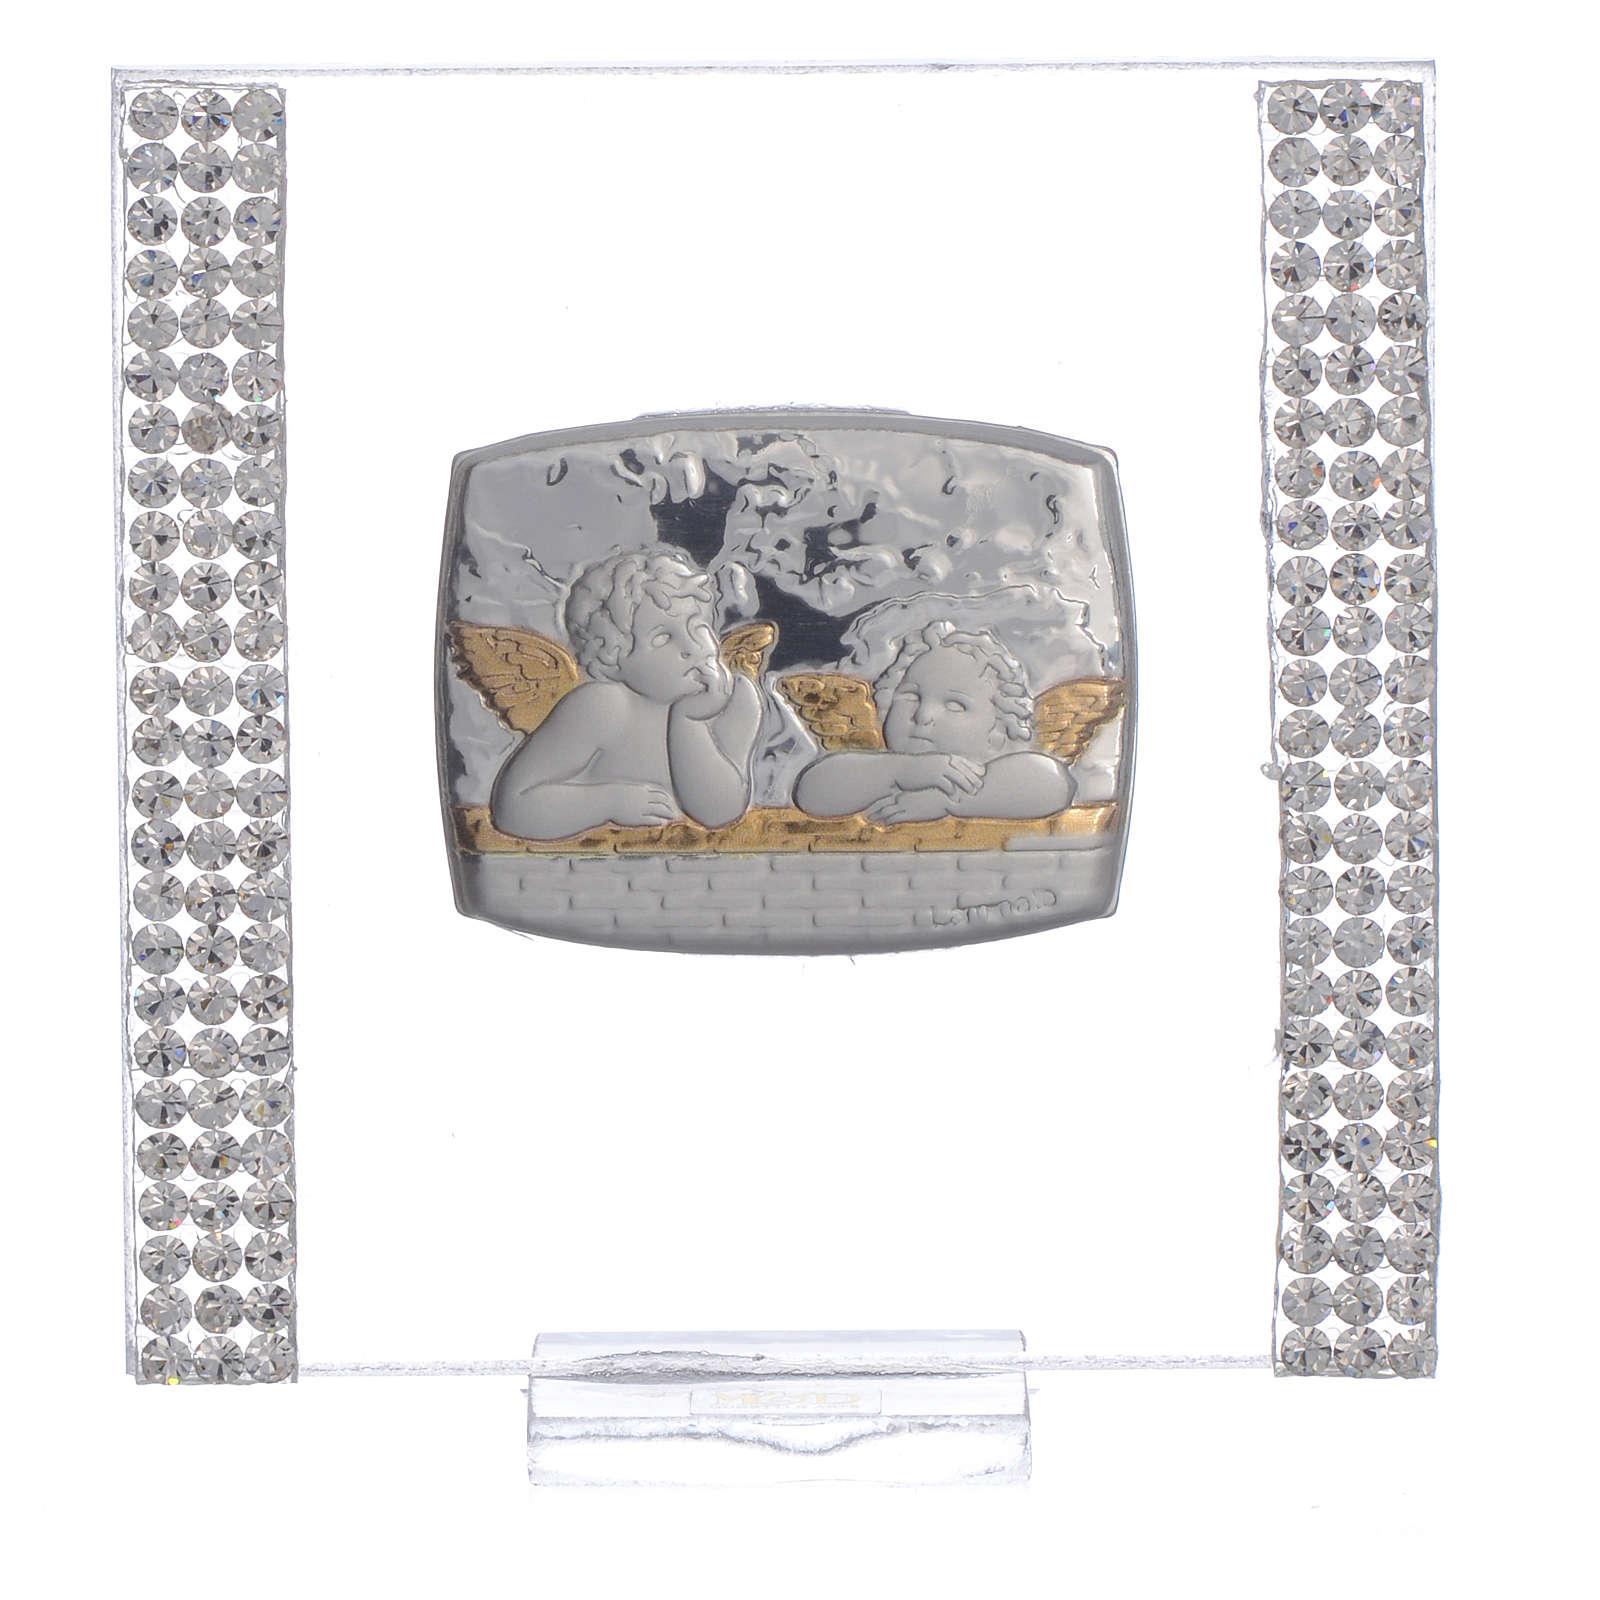 Pamiątka srebro i brokat 7x7cm Anioł 3